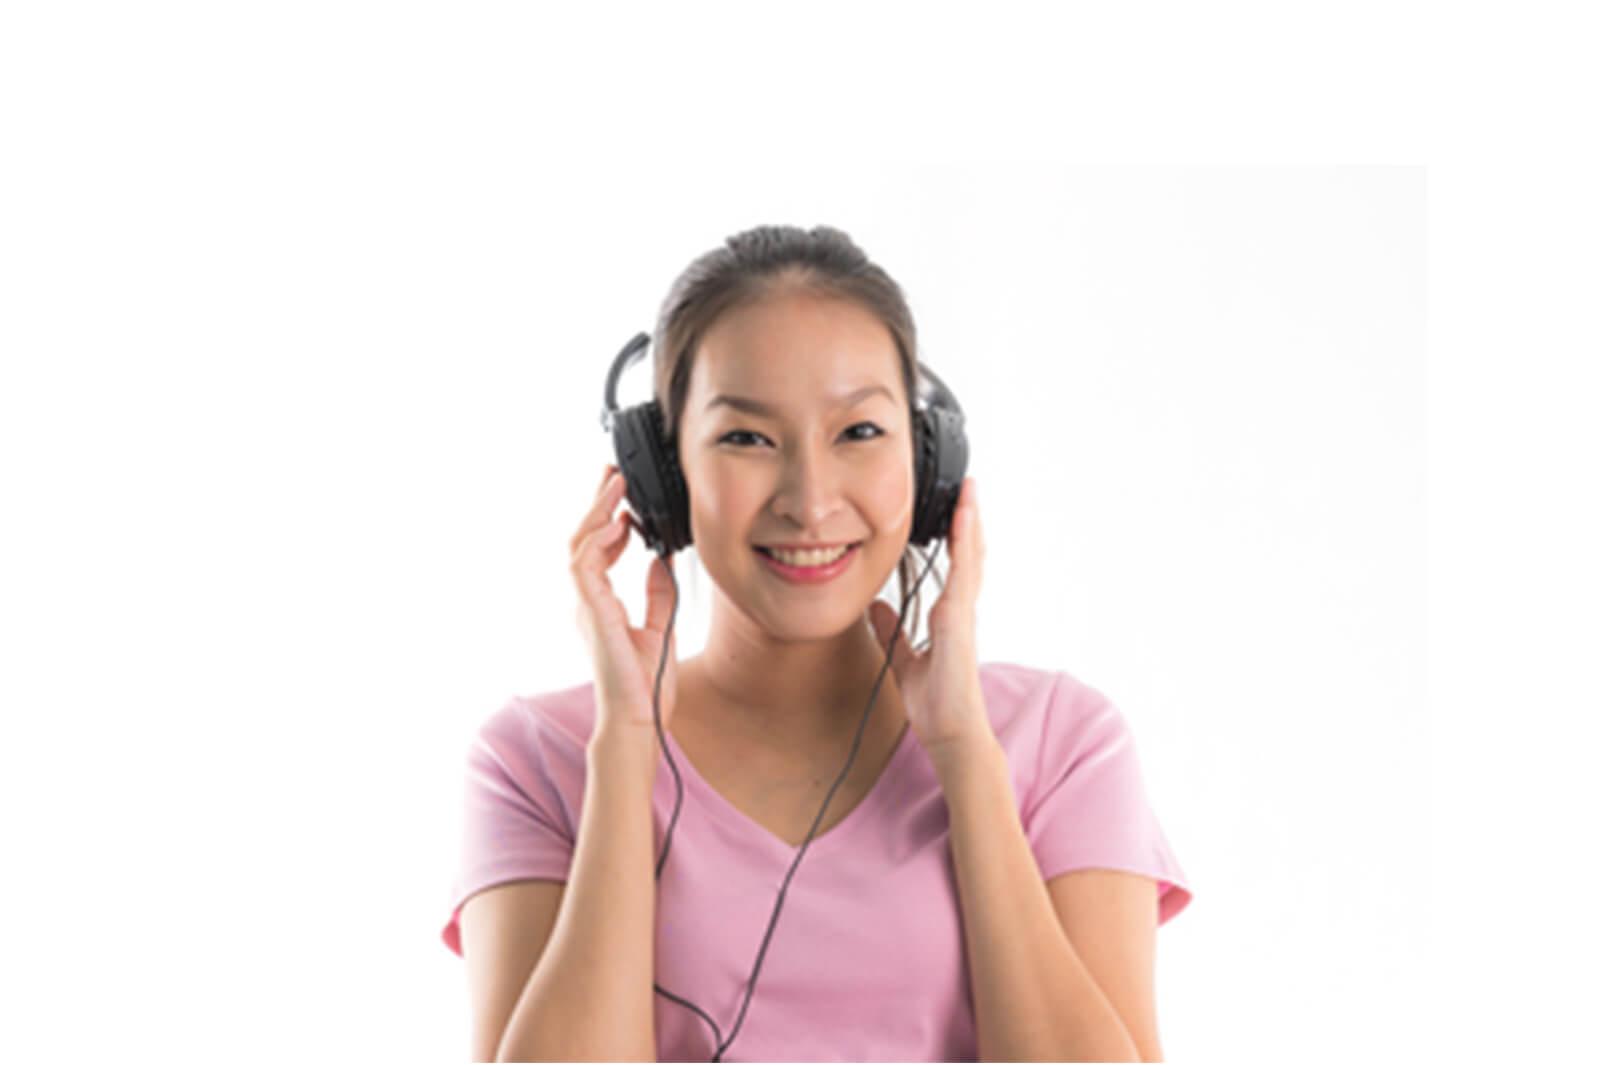 Manfaat Musik bagi Janin selama Proses Kehamilan